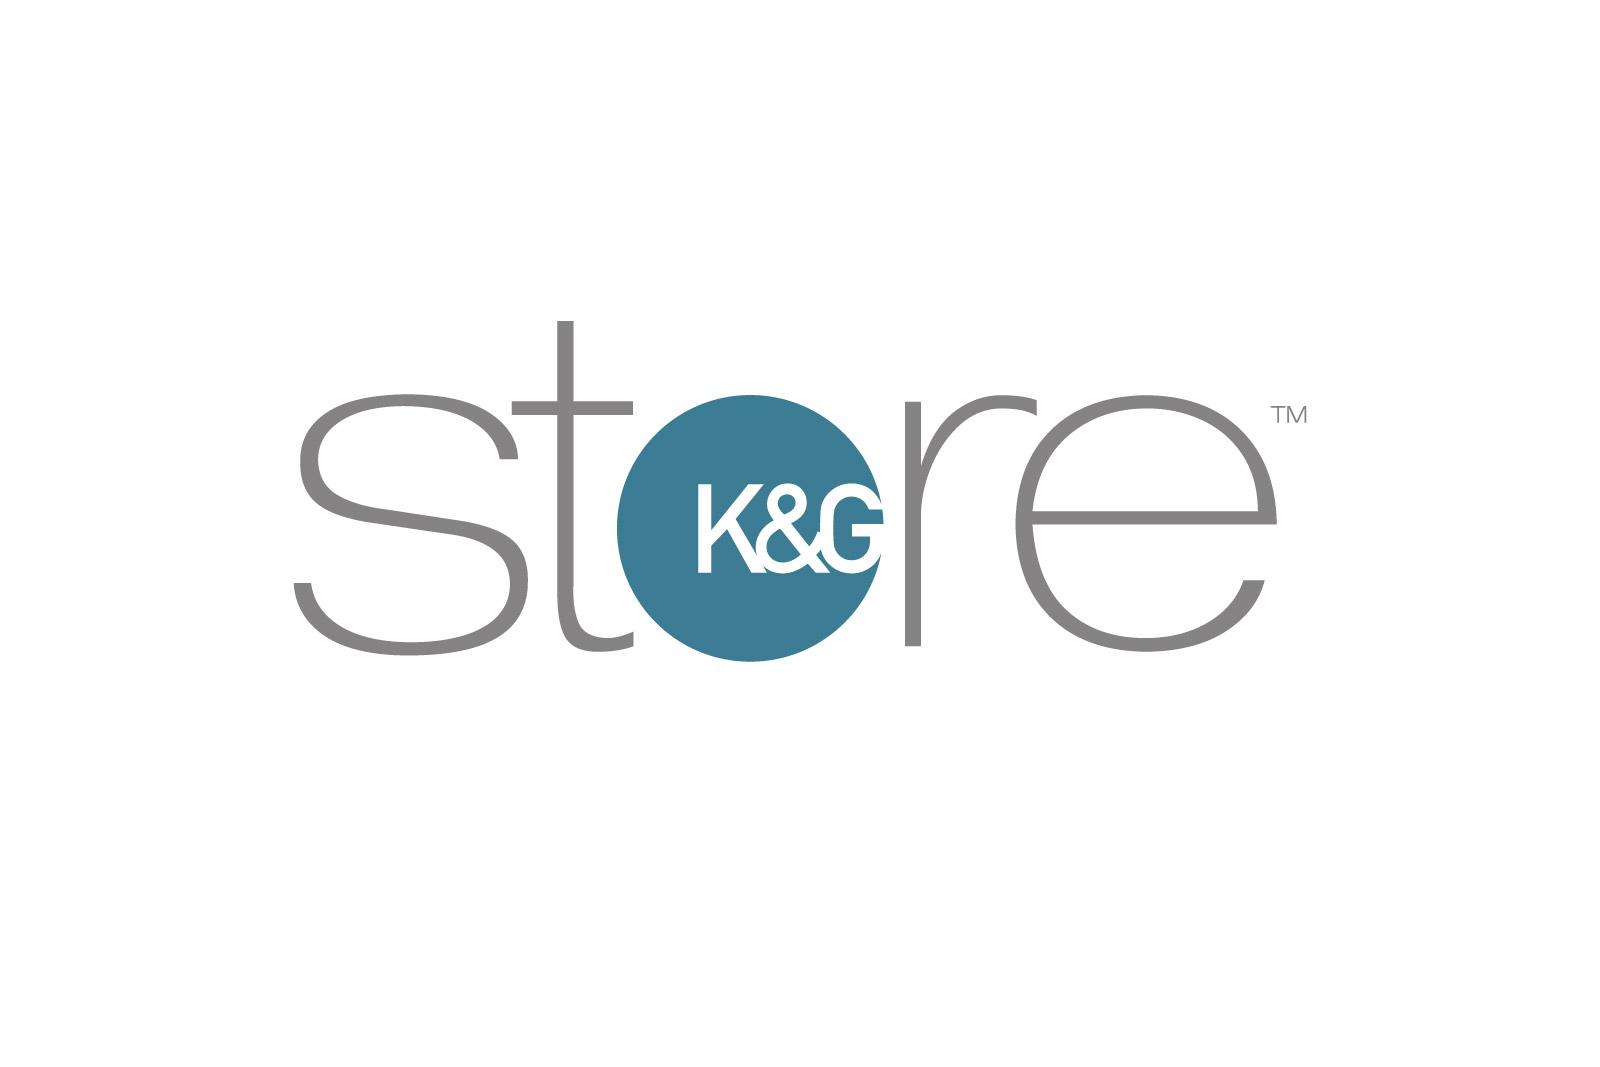 Asgard Branding, corporate identity, K&G, logo, Kutush & Gonzaga, design, store branding, online store, retaile, branding